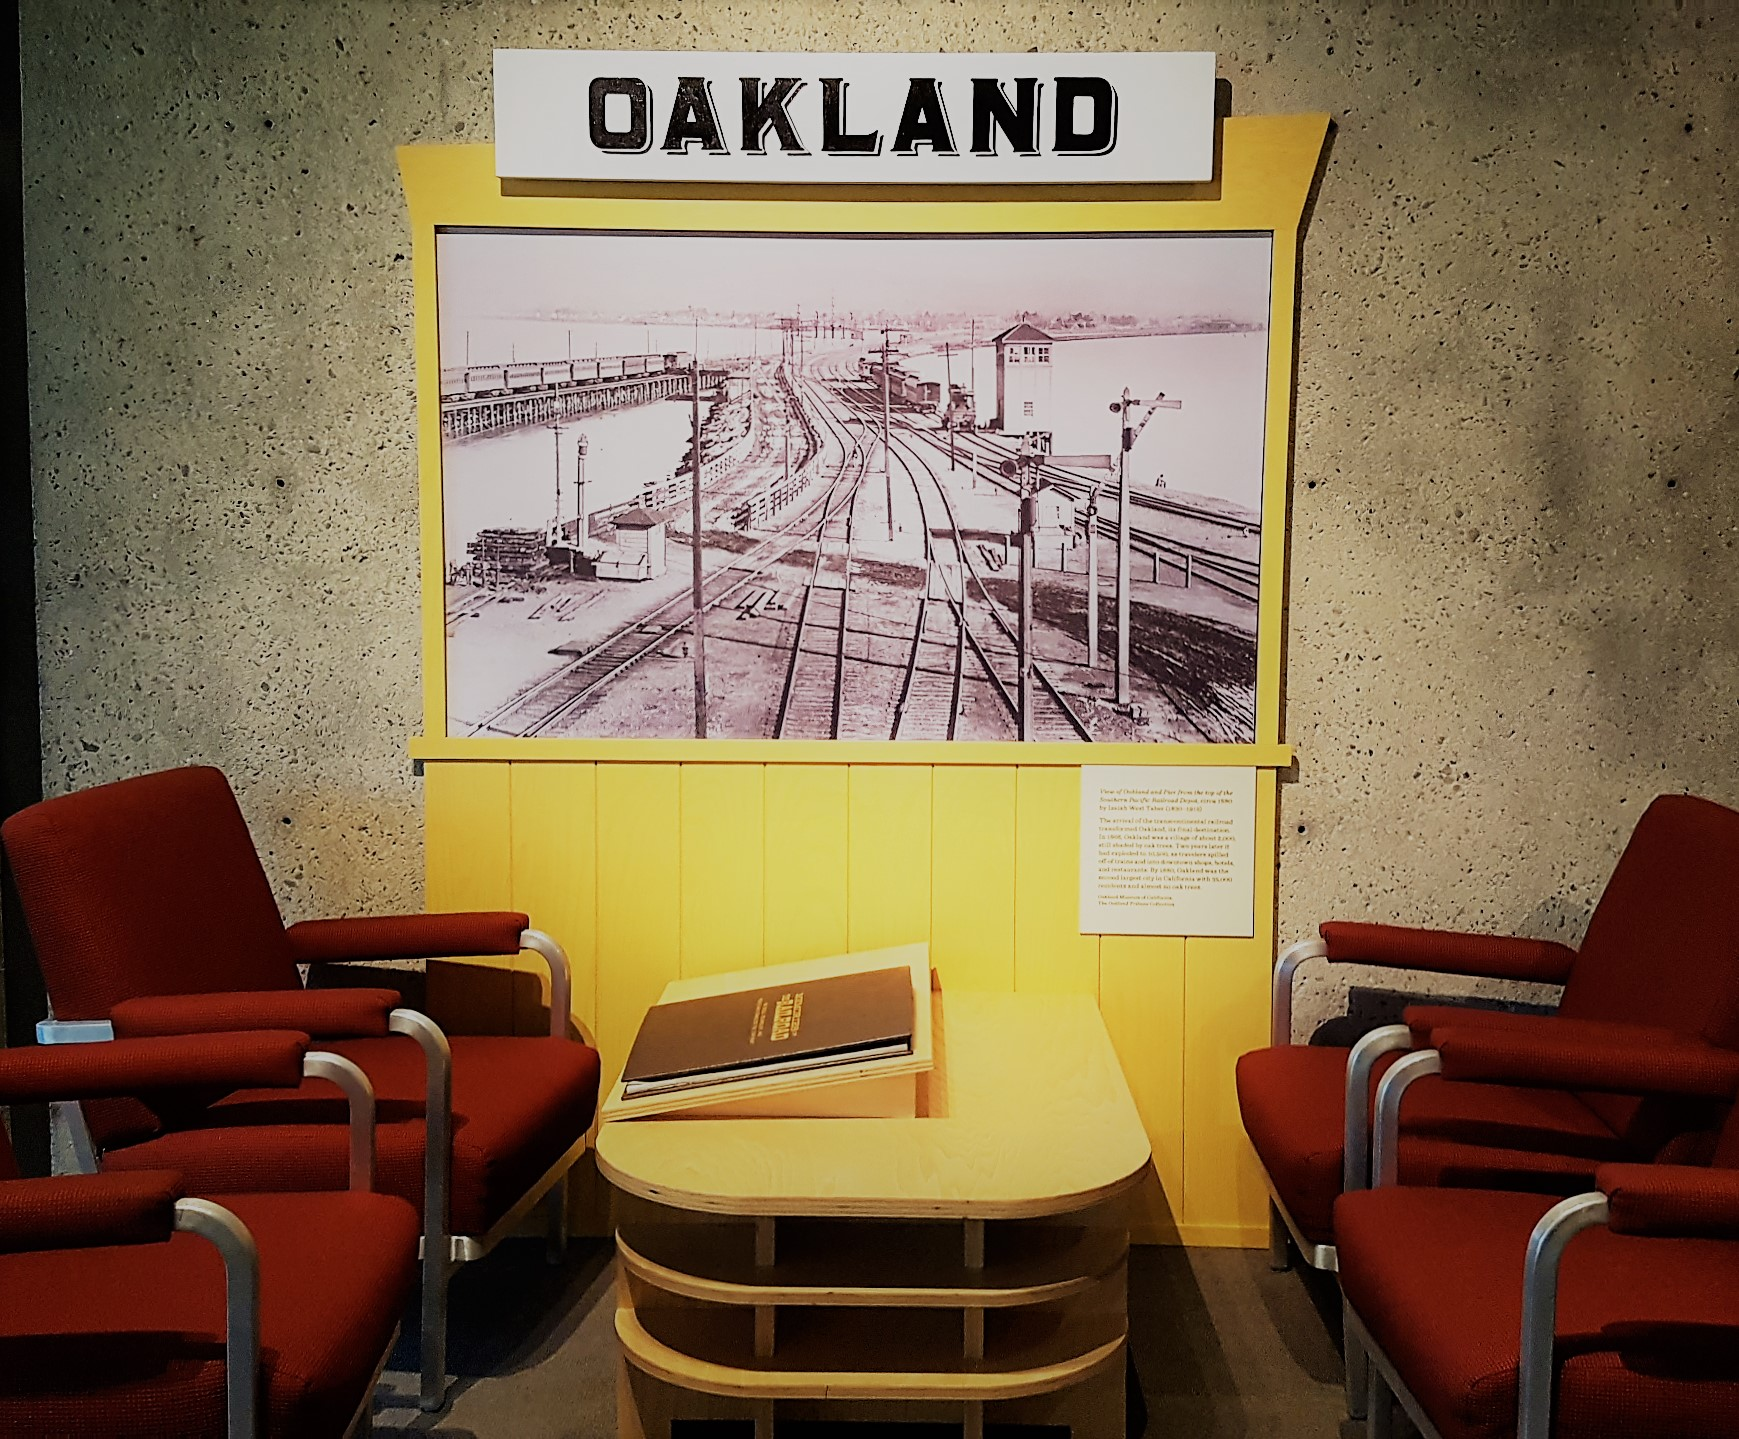 sala d'attesa oakland museo california